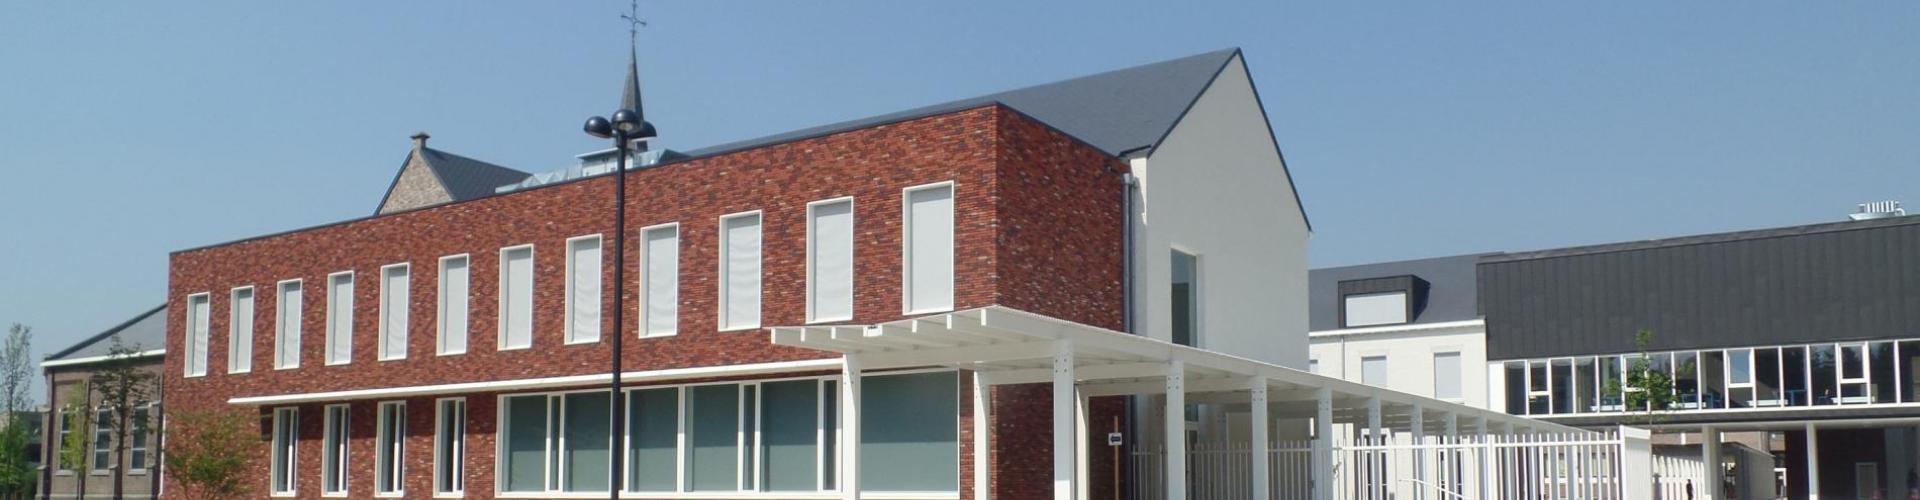 Sint-Franciscuscollege Heusden-Zolder